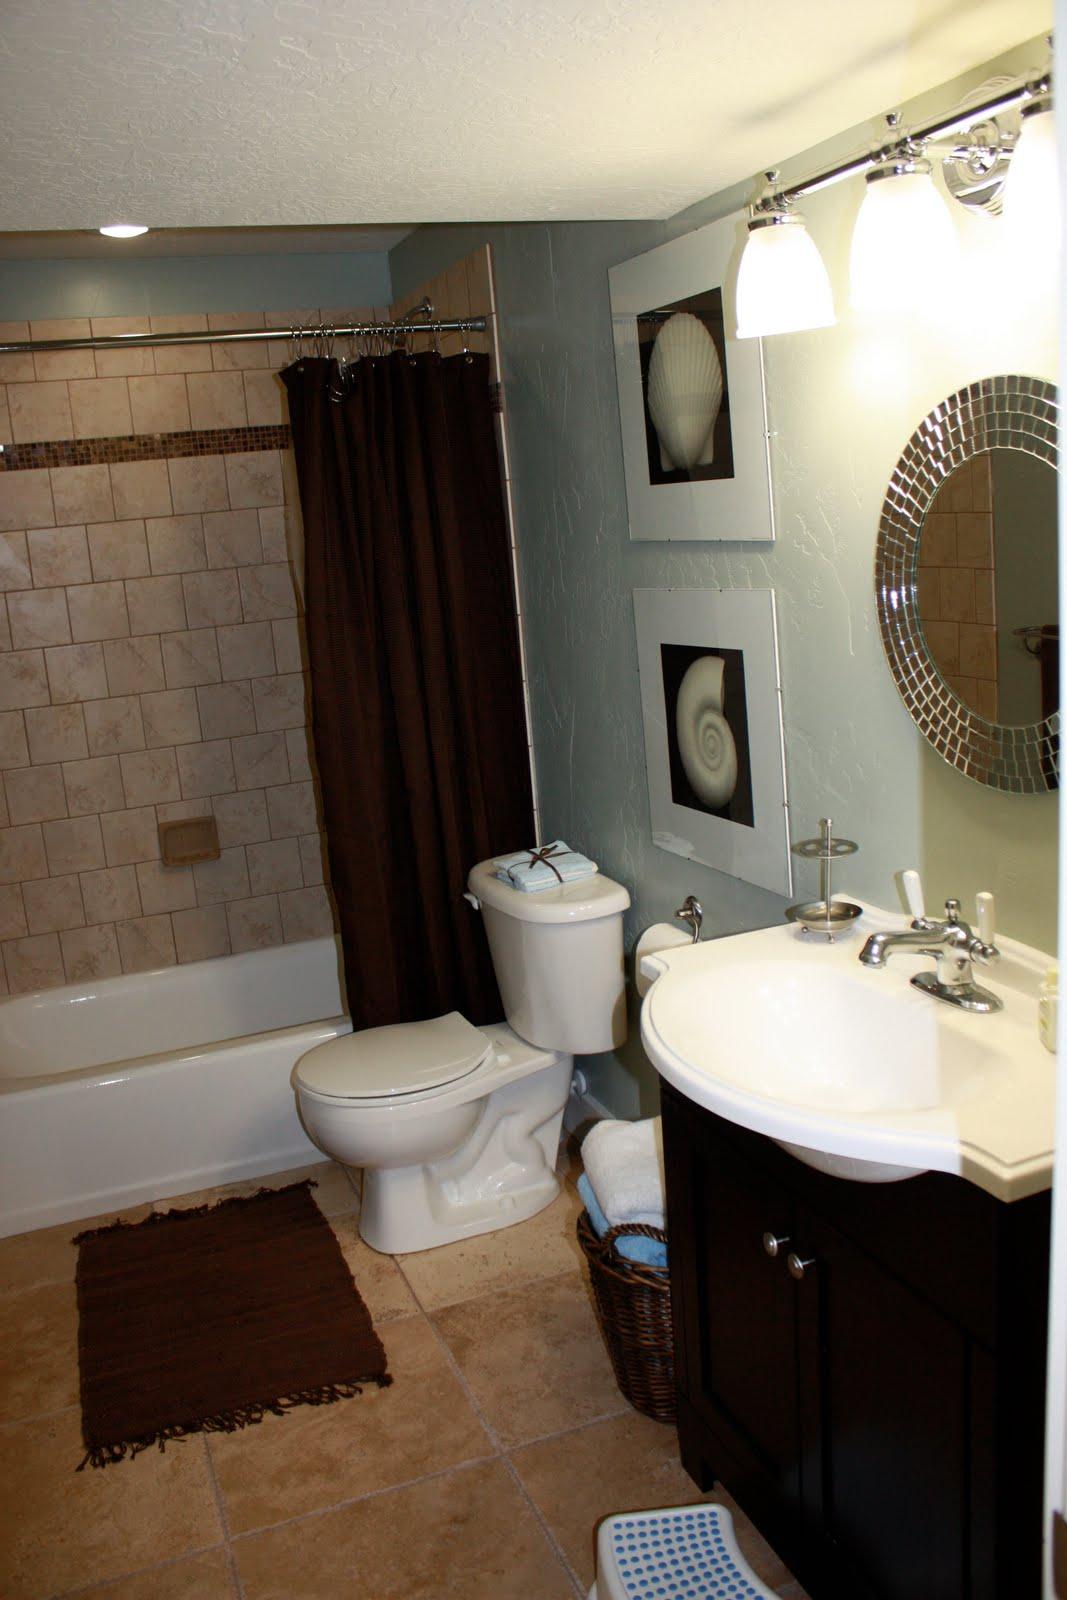 A Little Great: A Little Decorating... Small Bathroom, Big ... on Small Bathroom Ideas Decor id=16629